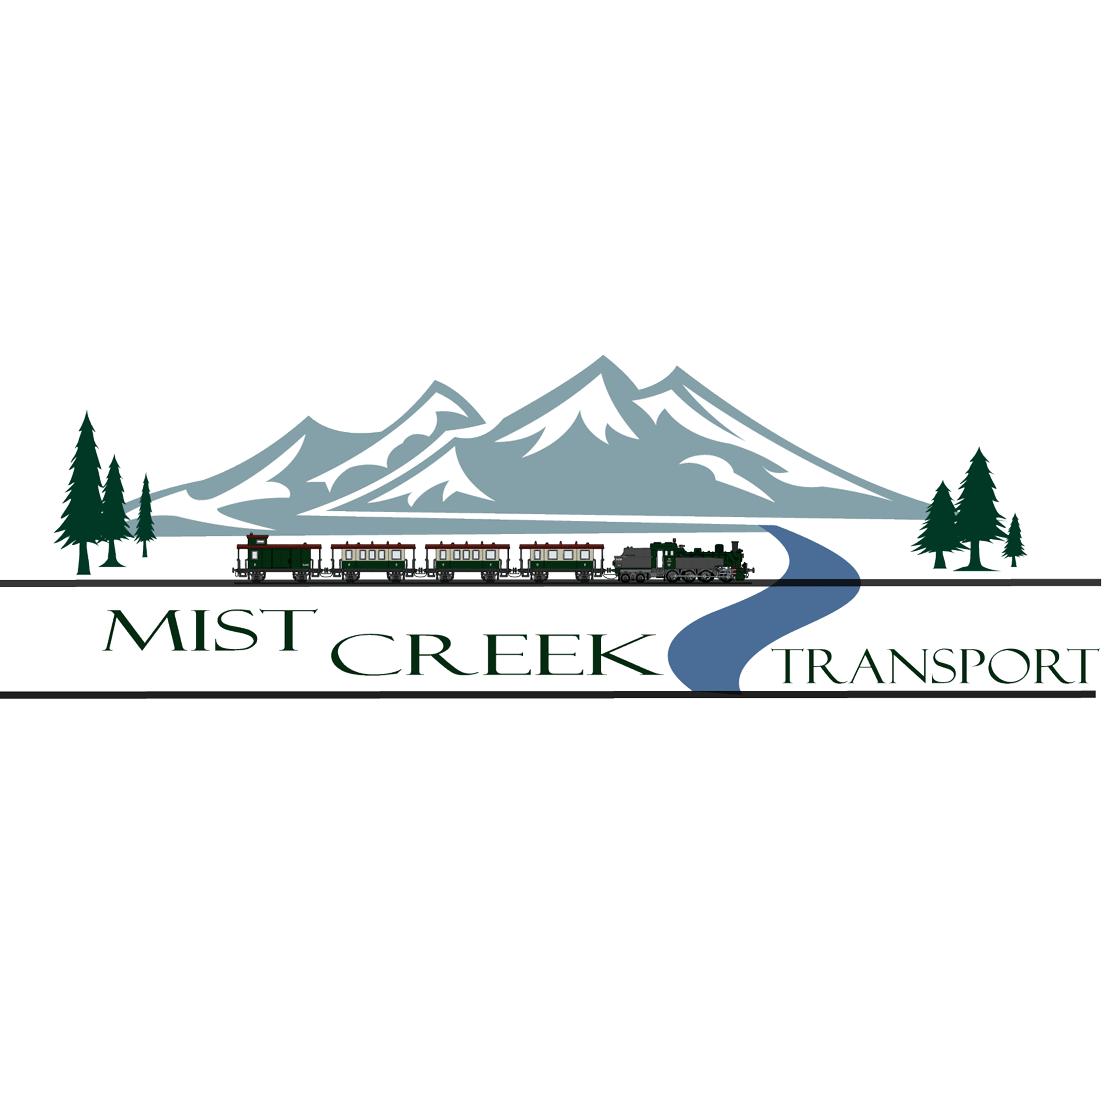 Mist Creek Transport image 8